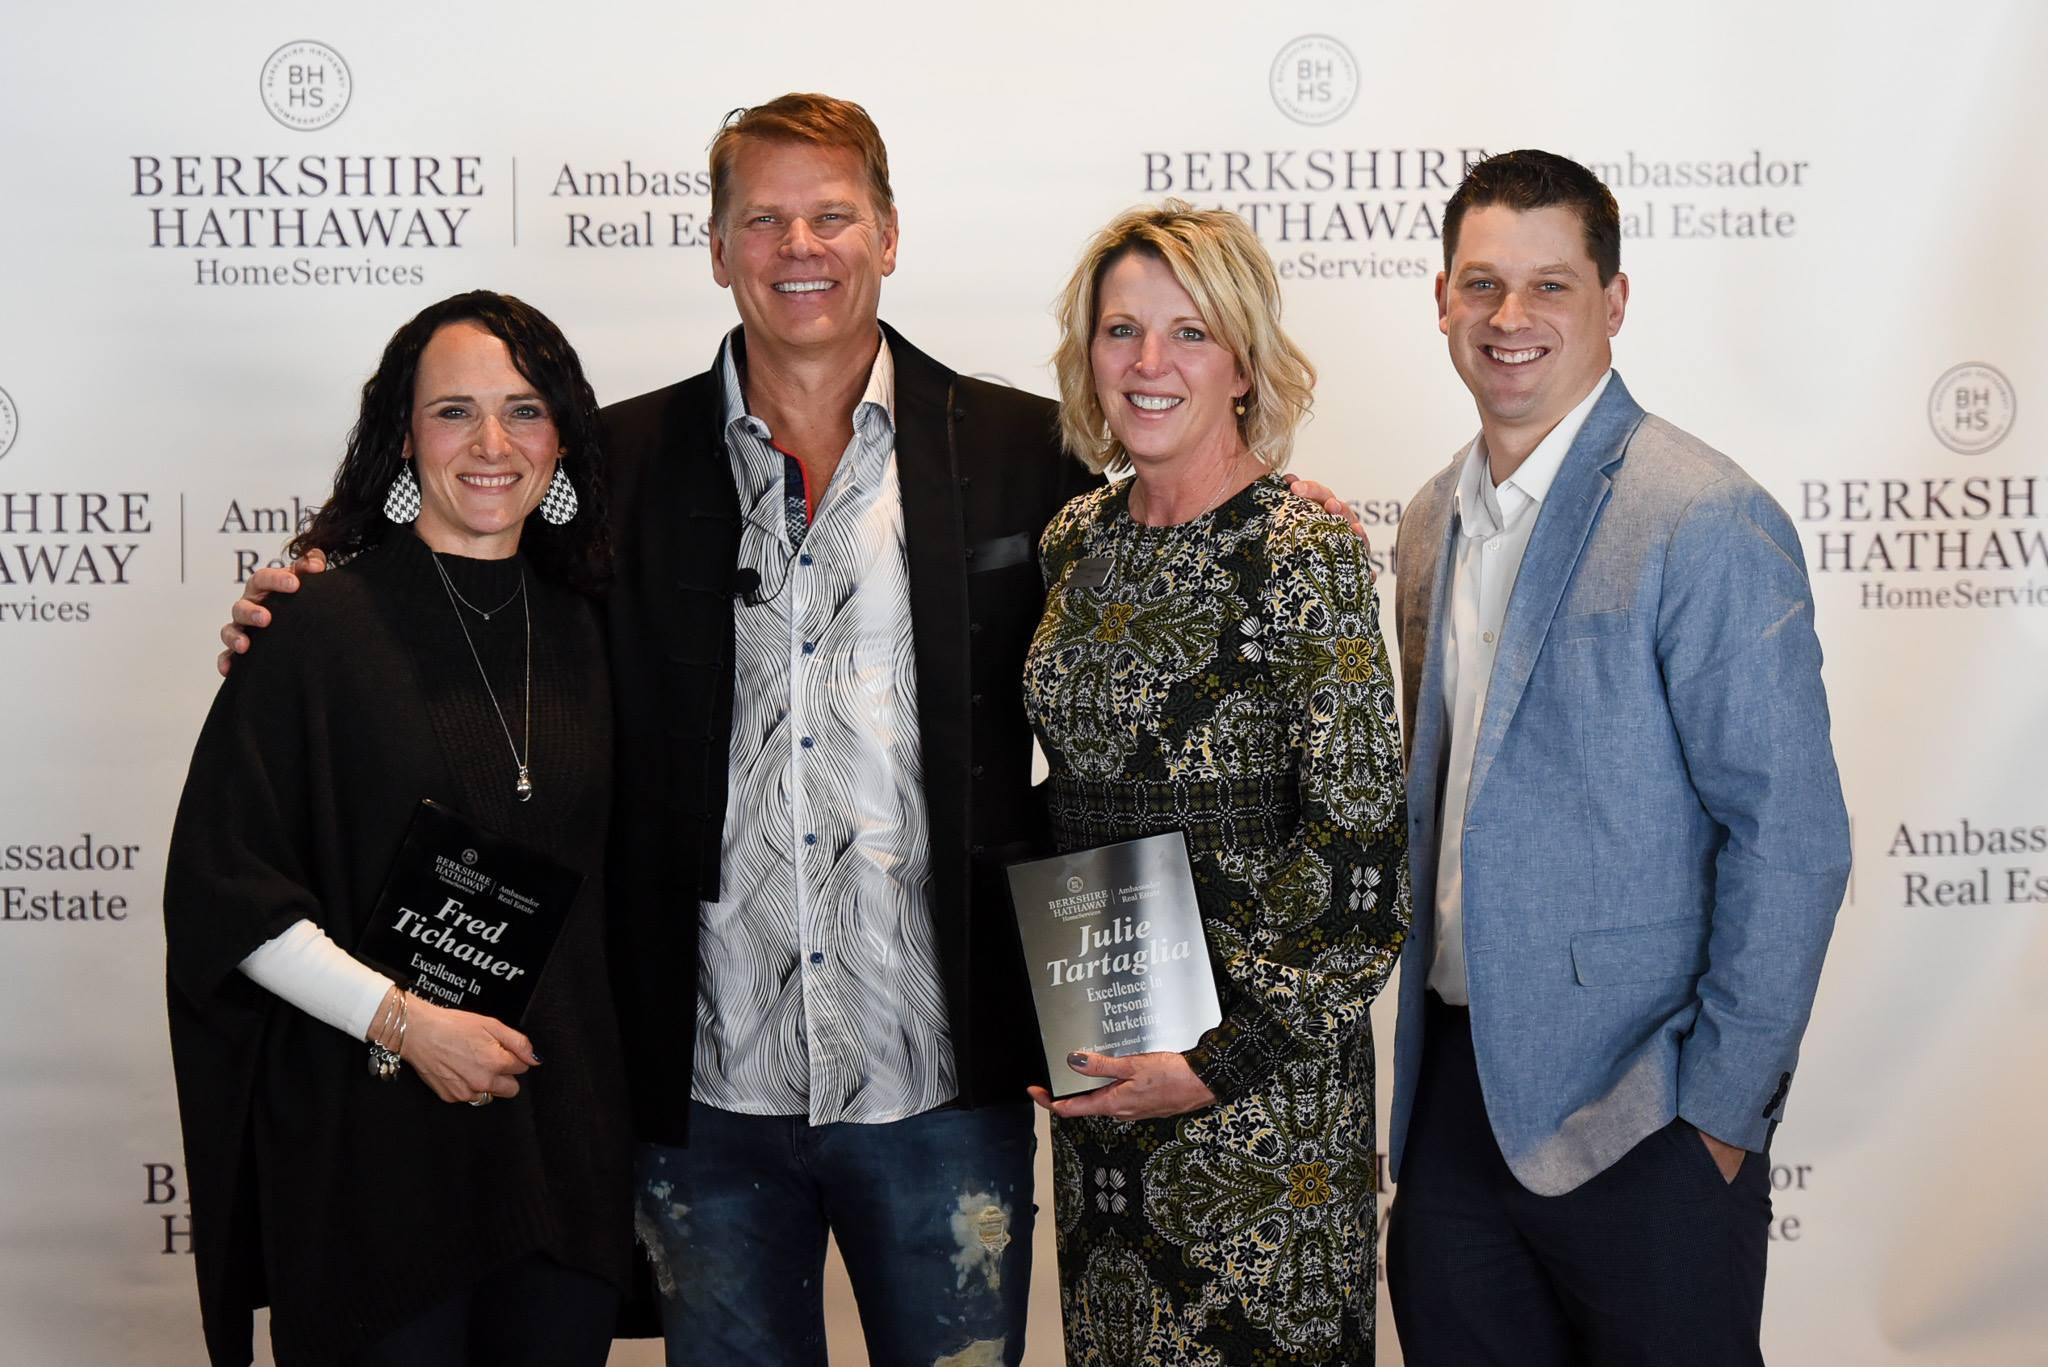 Berkshire Hathaway Home Services Ambassador Real Estate Awards Ceremony